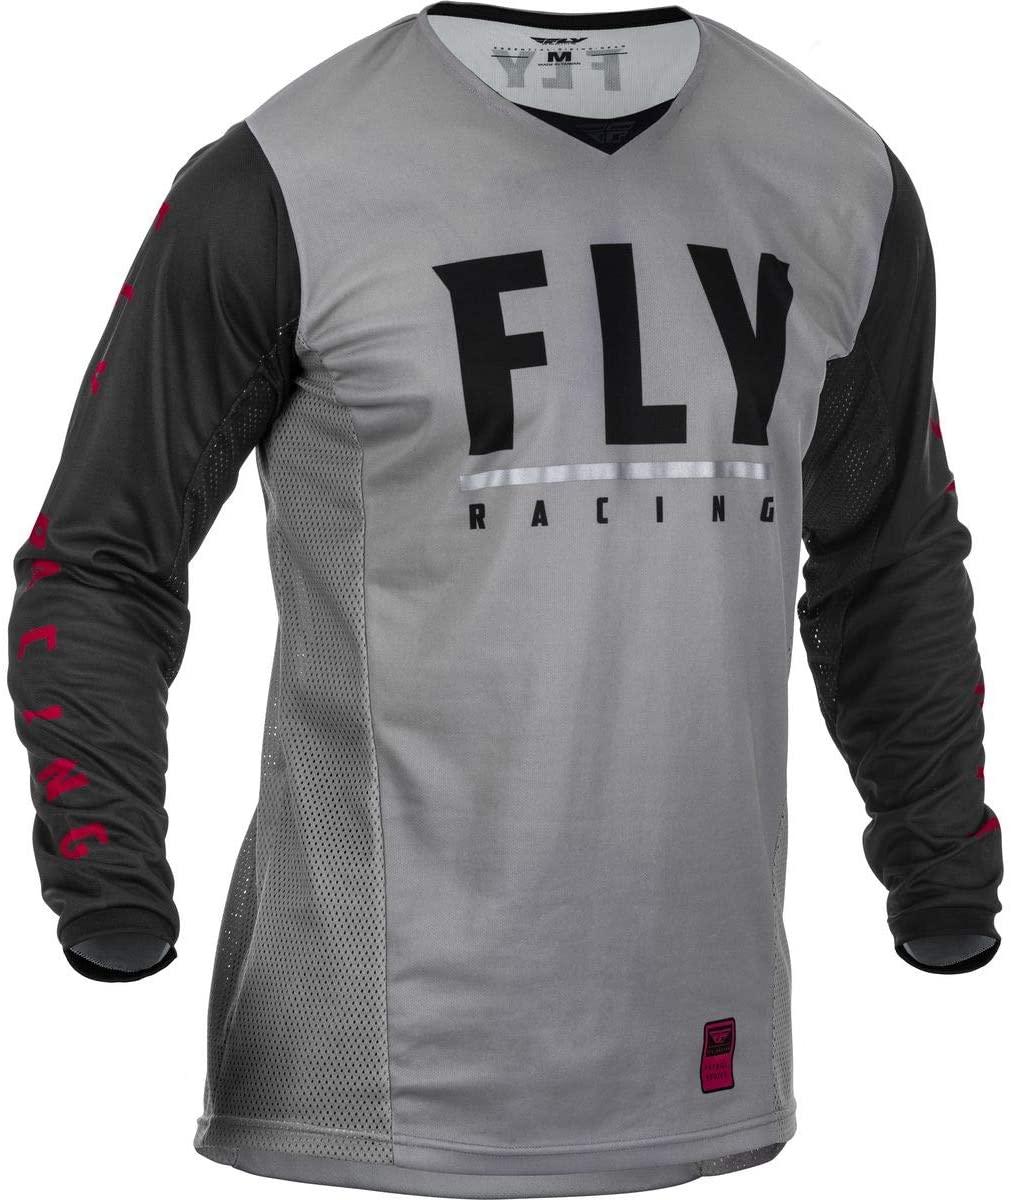 Fly Racing 2021 Patrol Jersey (Small) (Grey/Black)